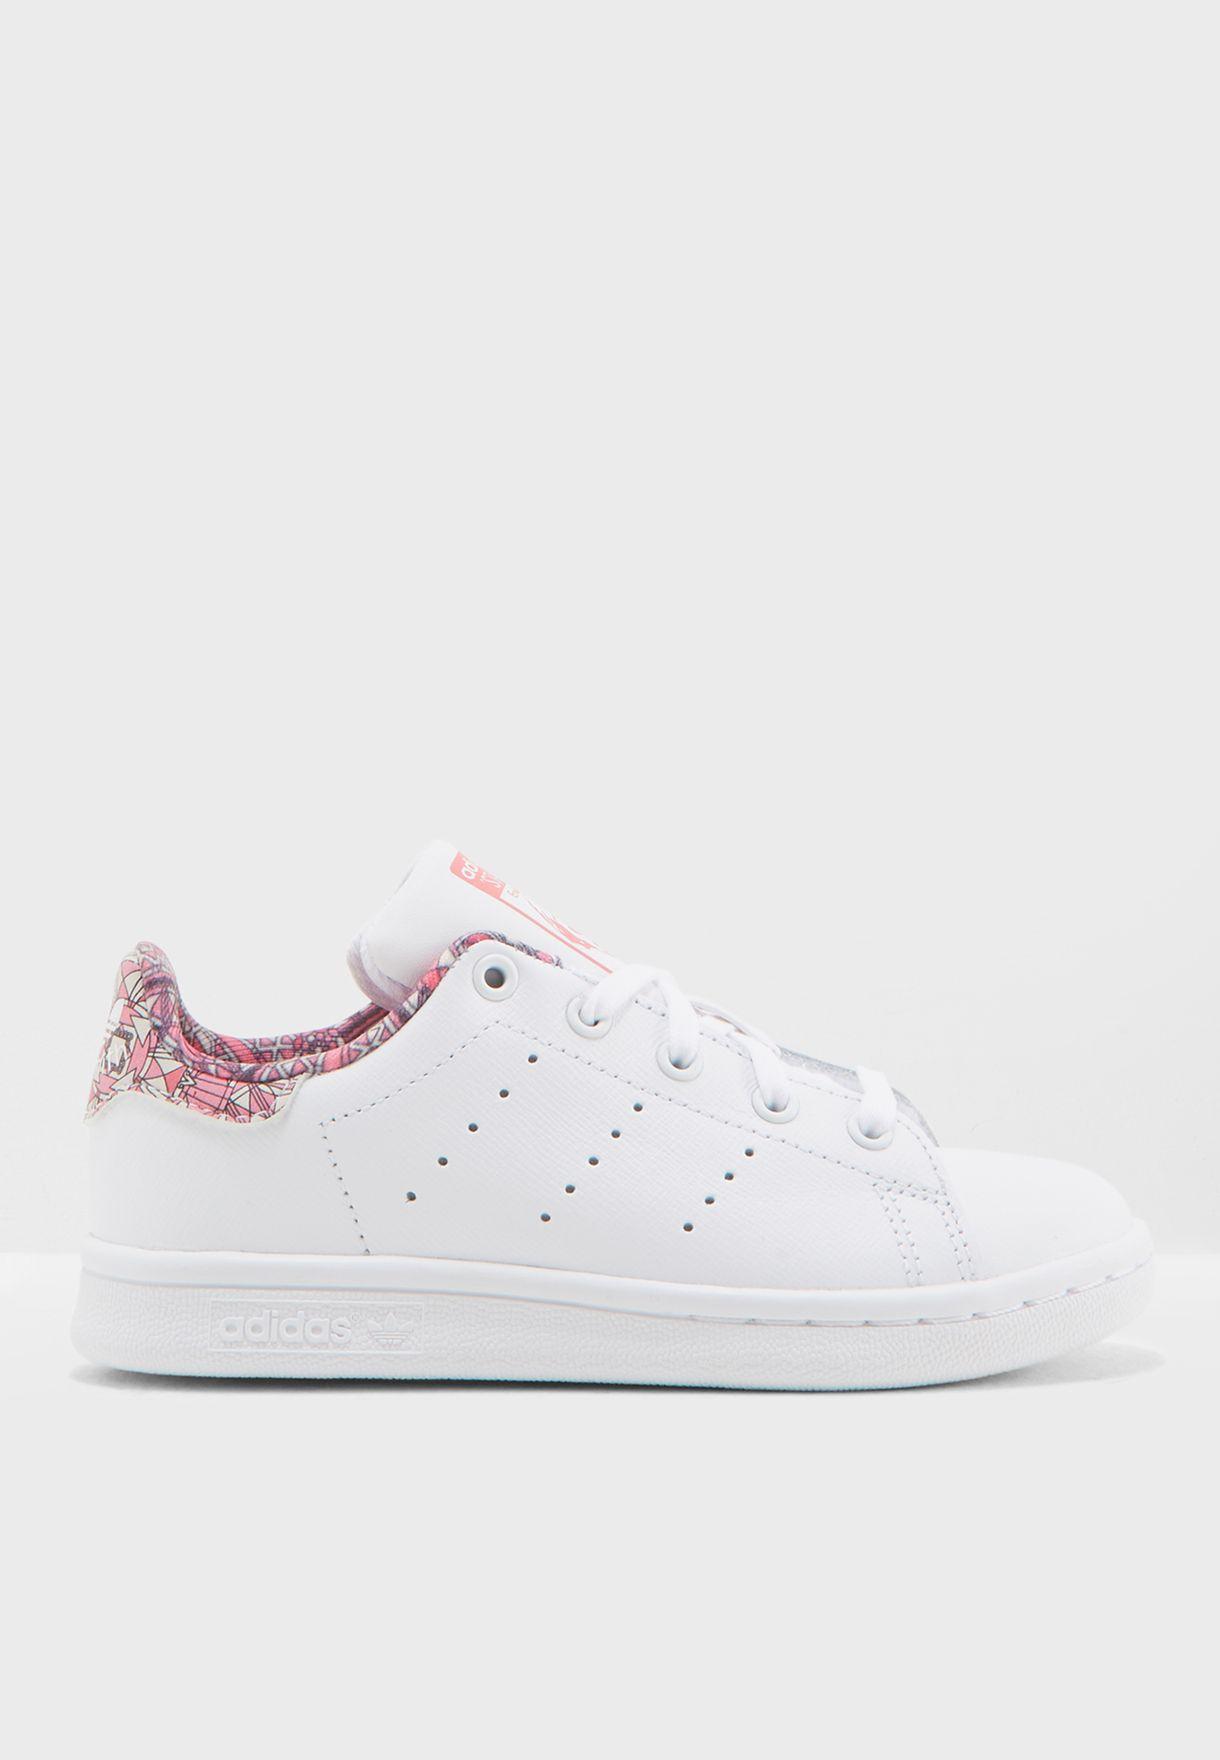 634c31a13 تسوق حذاء ستان سميث جلد أصلي ماركة اديداس اورجينال لون أبيض CM8173 ...